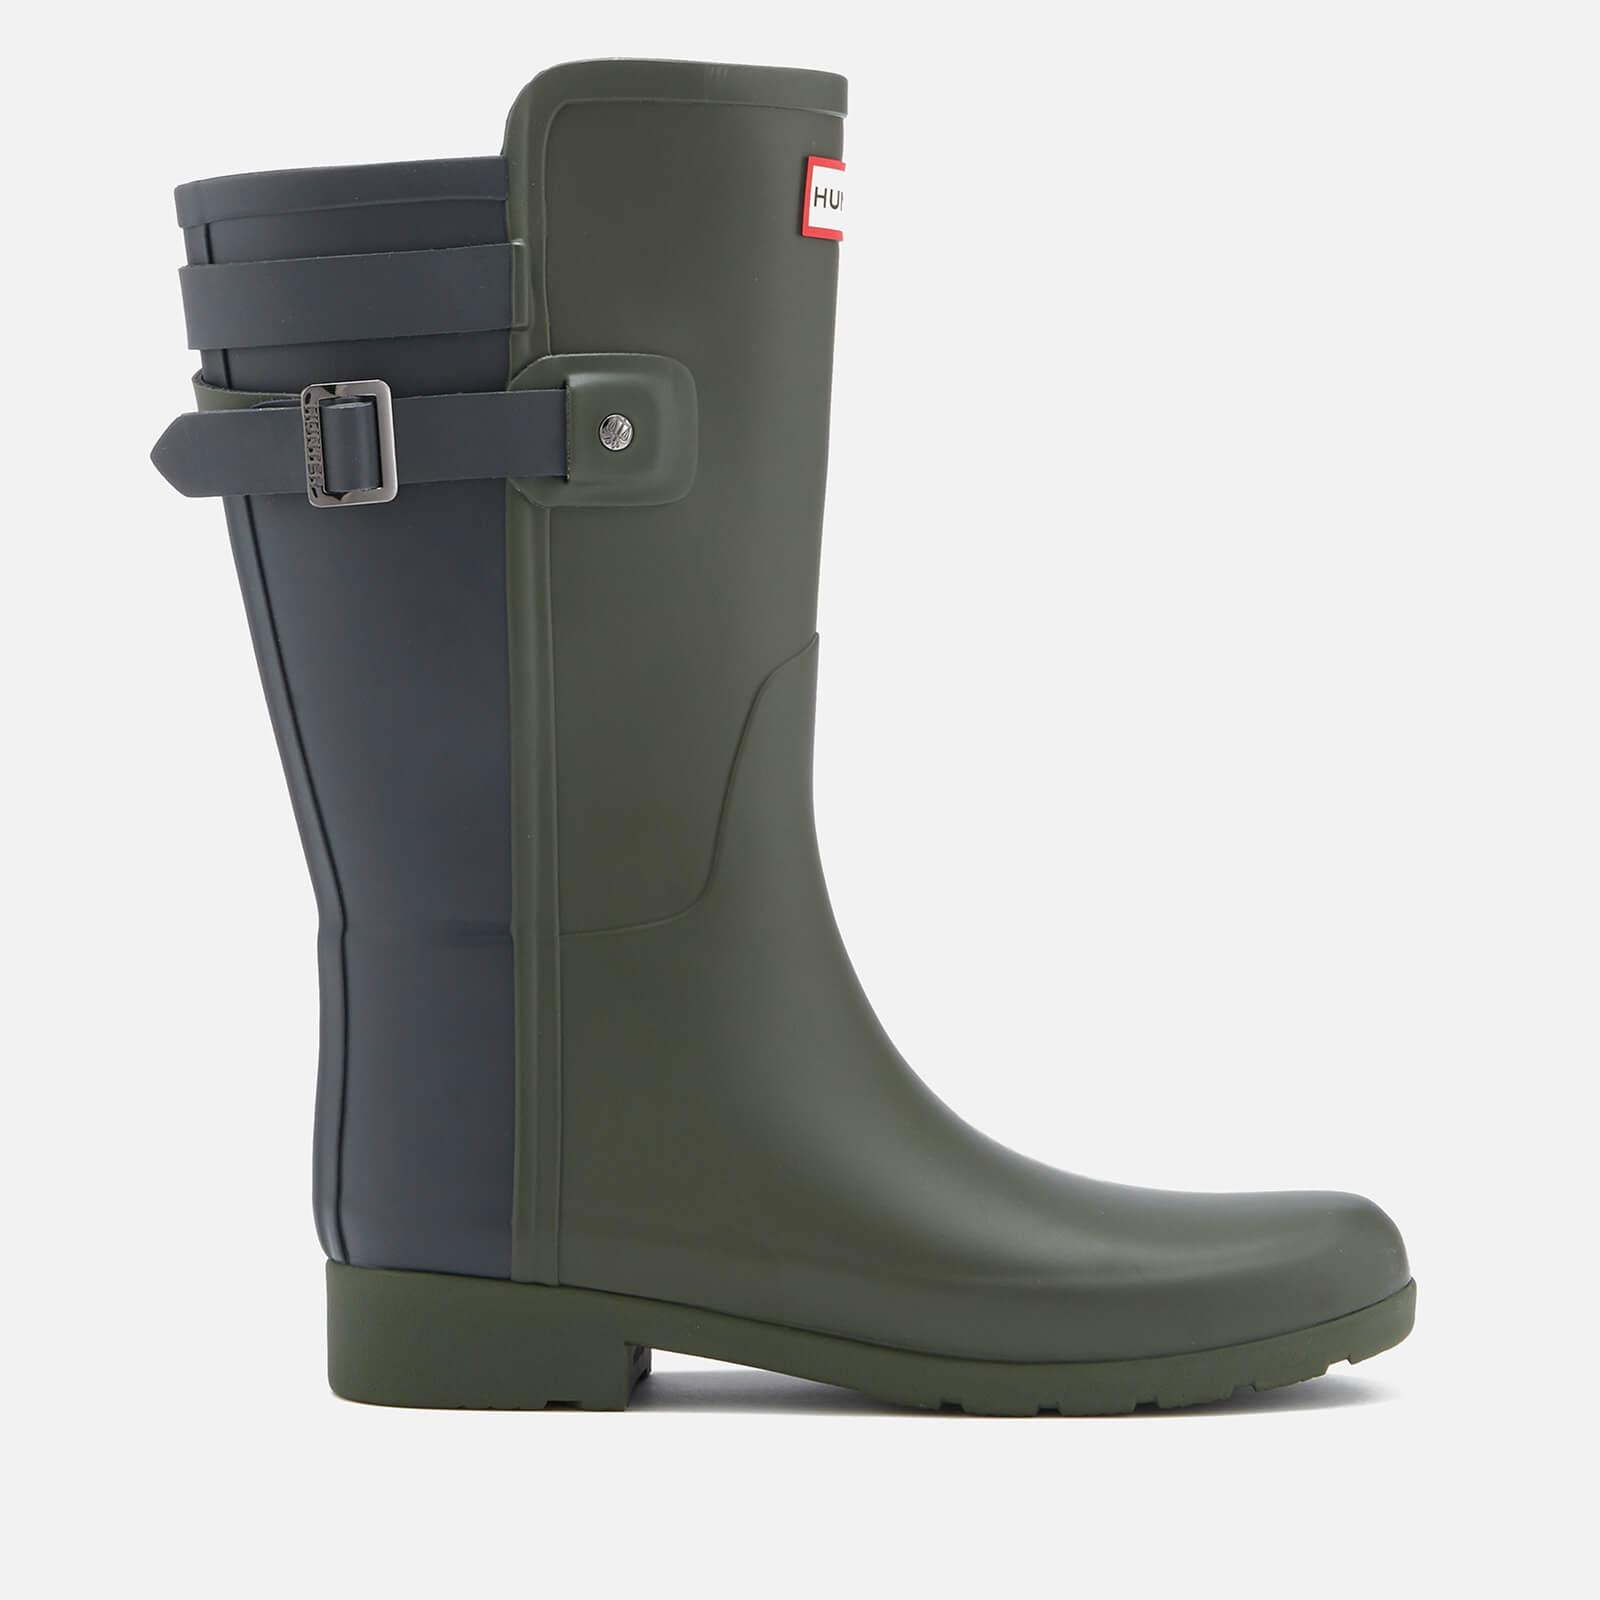 2b41fca10 Hunter Women s Original Short Back Strap Refined Wellies - Dark Olive Navy  Womens Footwear